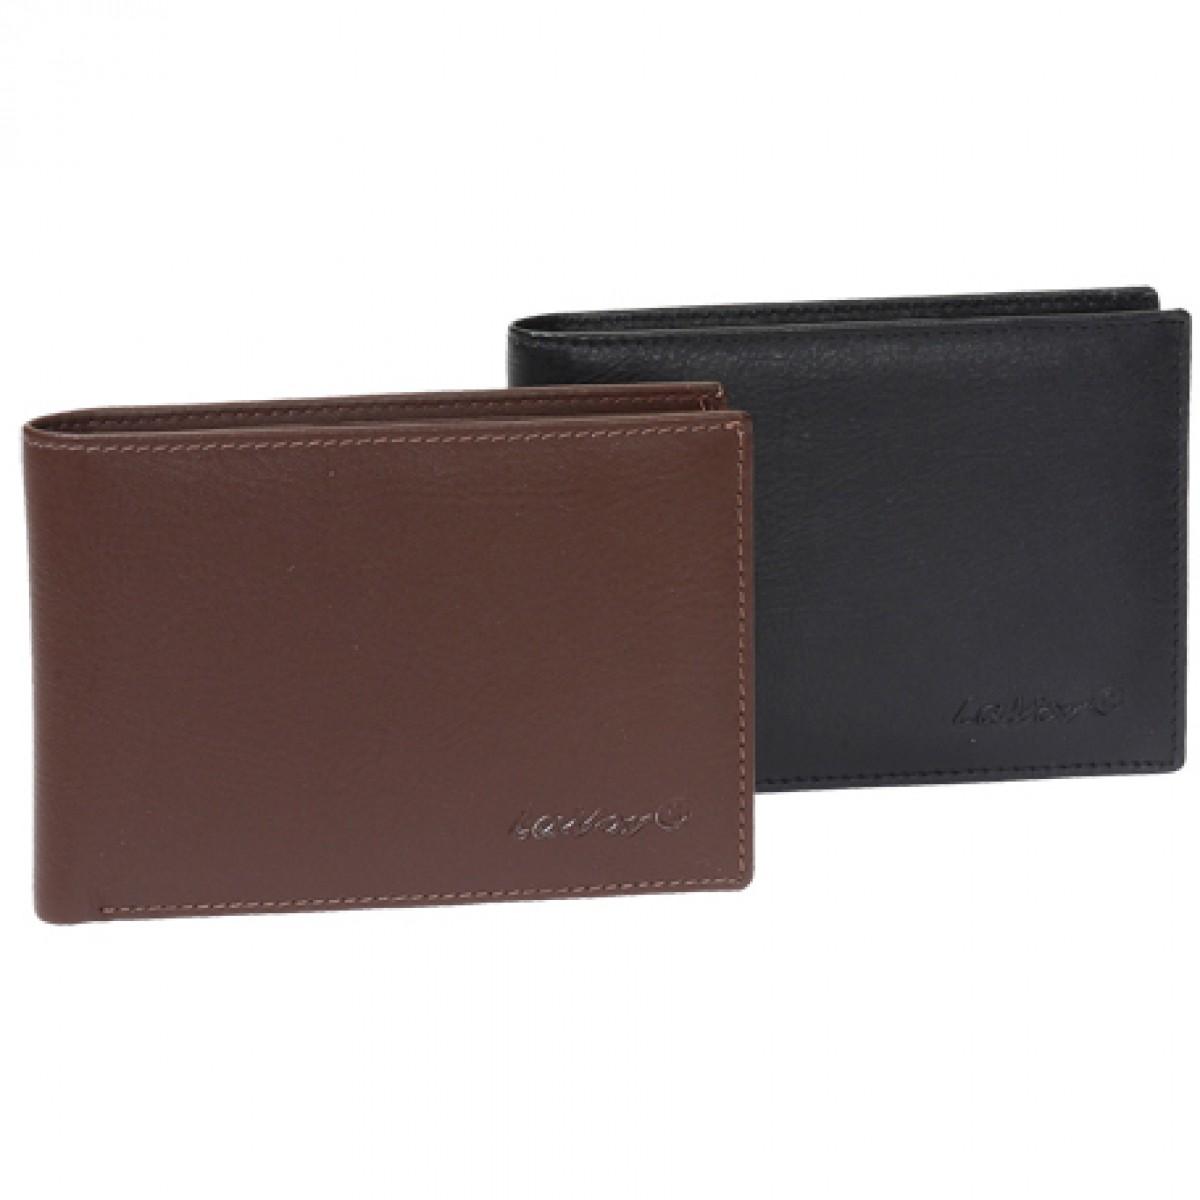 a1a1b2c435 Δερμάτινο ανδρικό πορτοφόλι LAVOR 1-6558BLU ΜΠΛΕ ΧΡΩΜΑ με RFID ΠΡΟΣΤΑΣΙΑ  (Θήκη